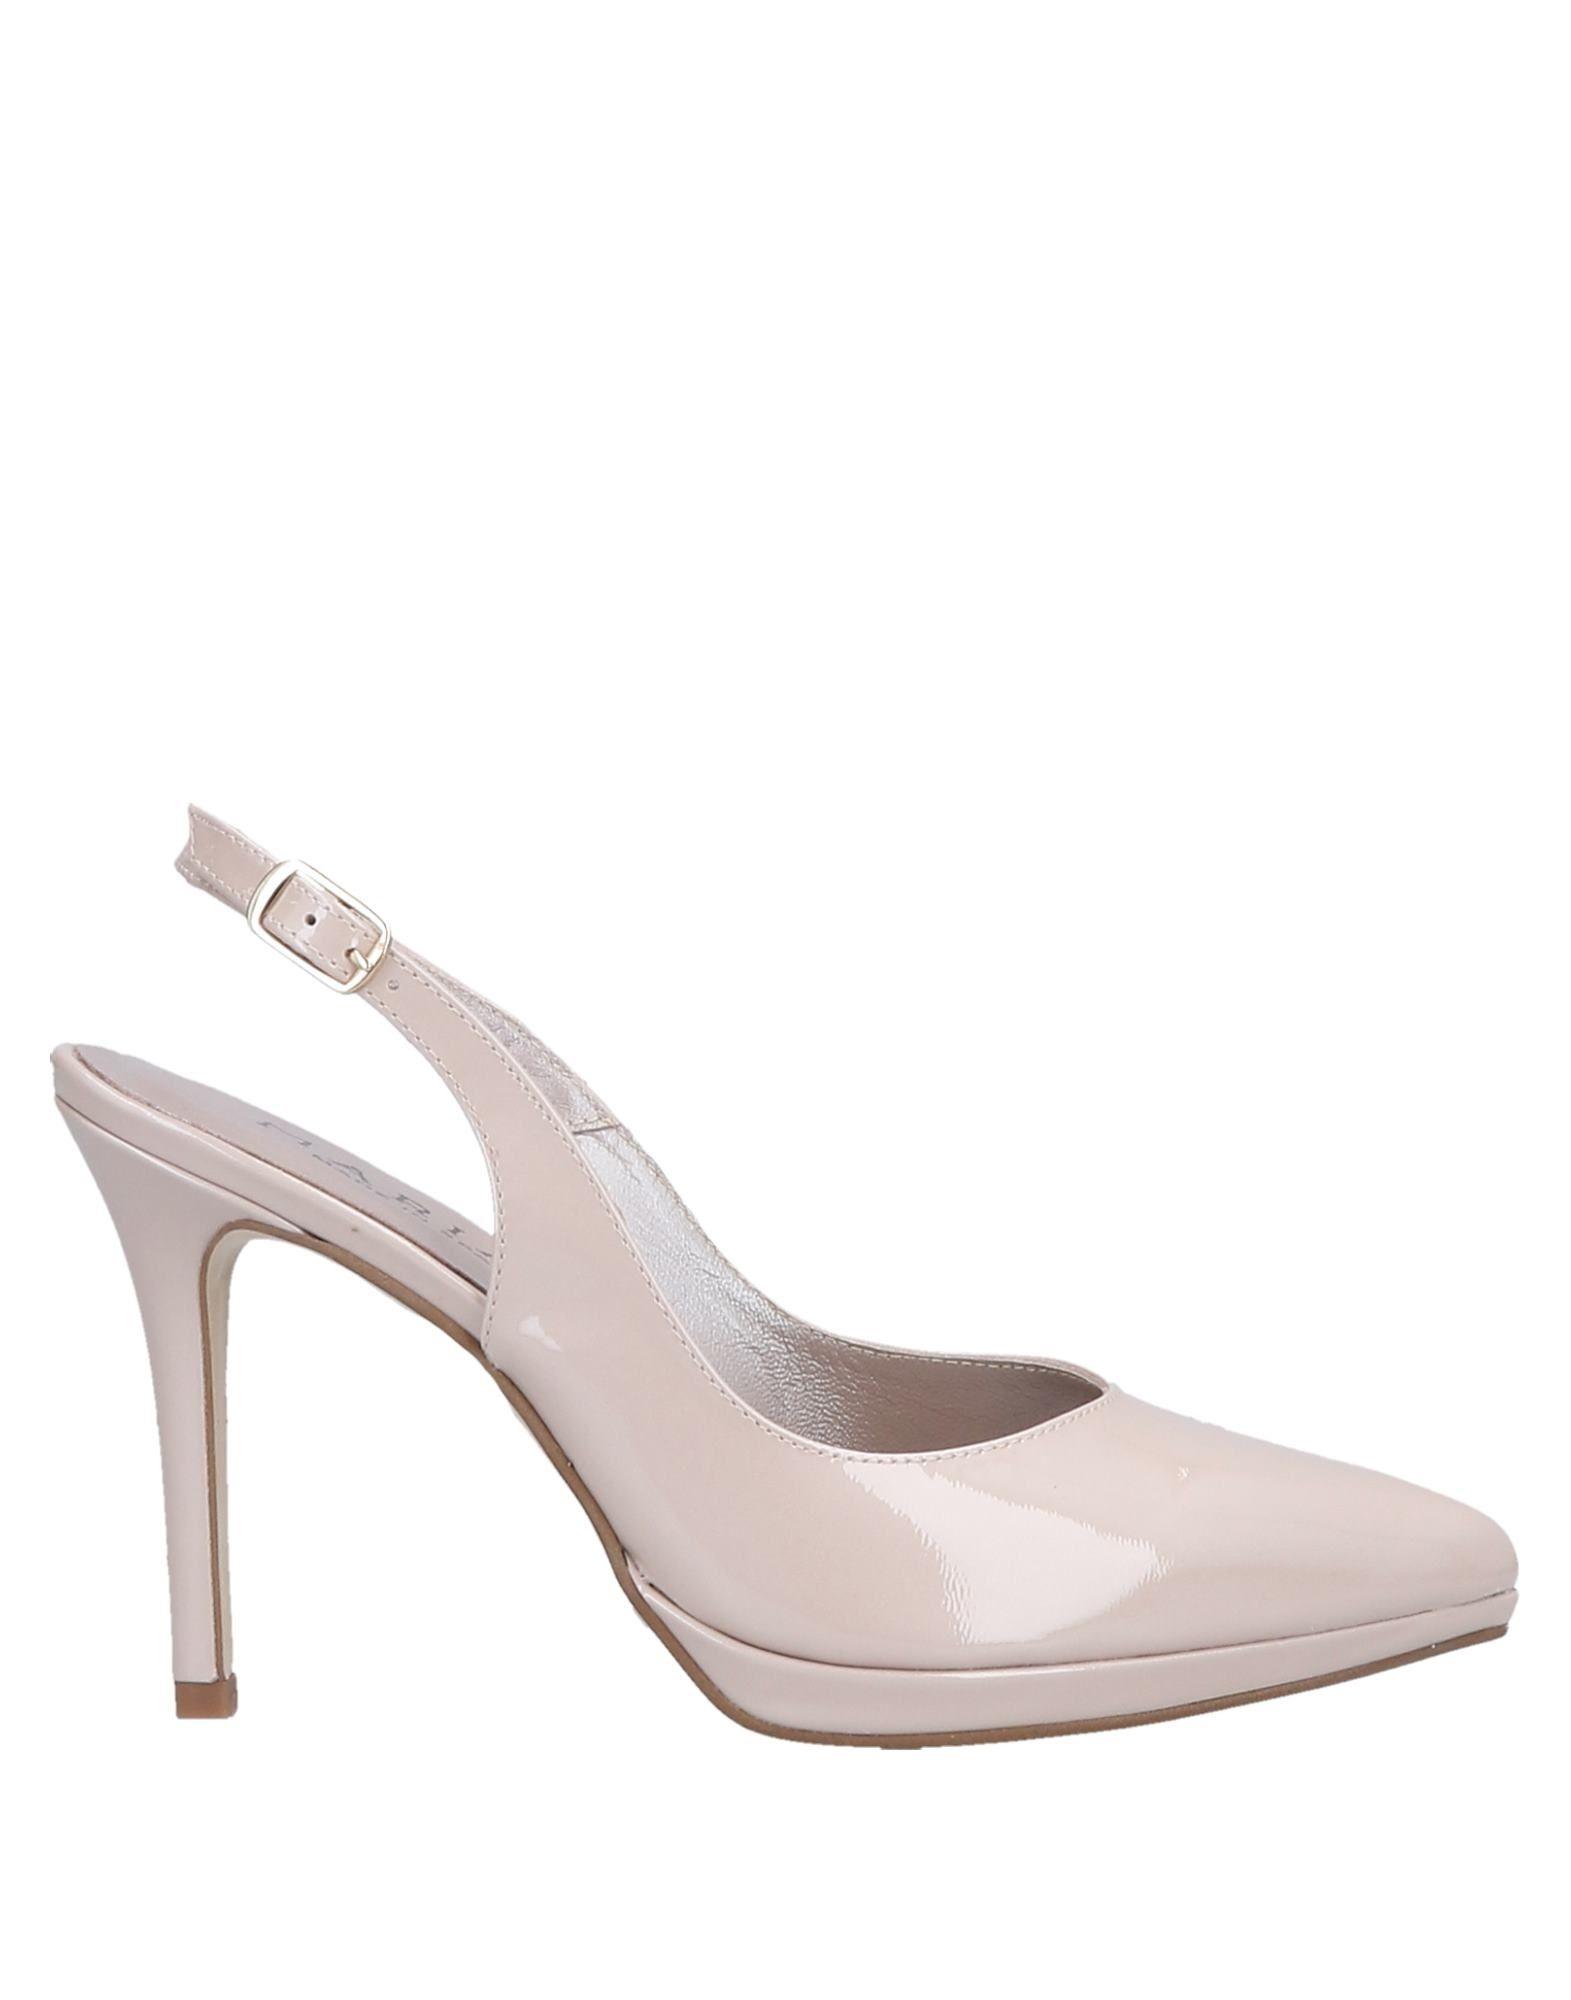 Sandali Fiorifrancesi Donna - 11456742HC comode Nuove offerte e scarpe comode 11456742HC 7551a6